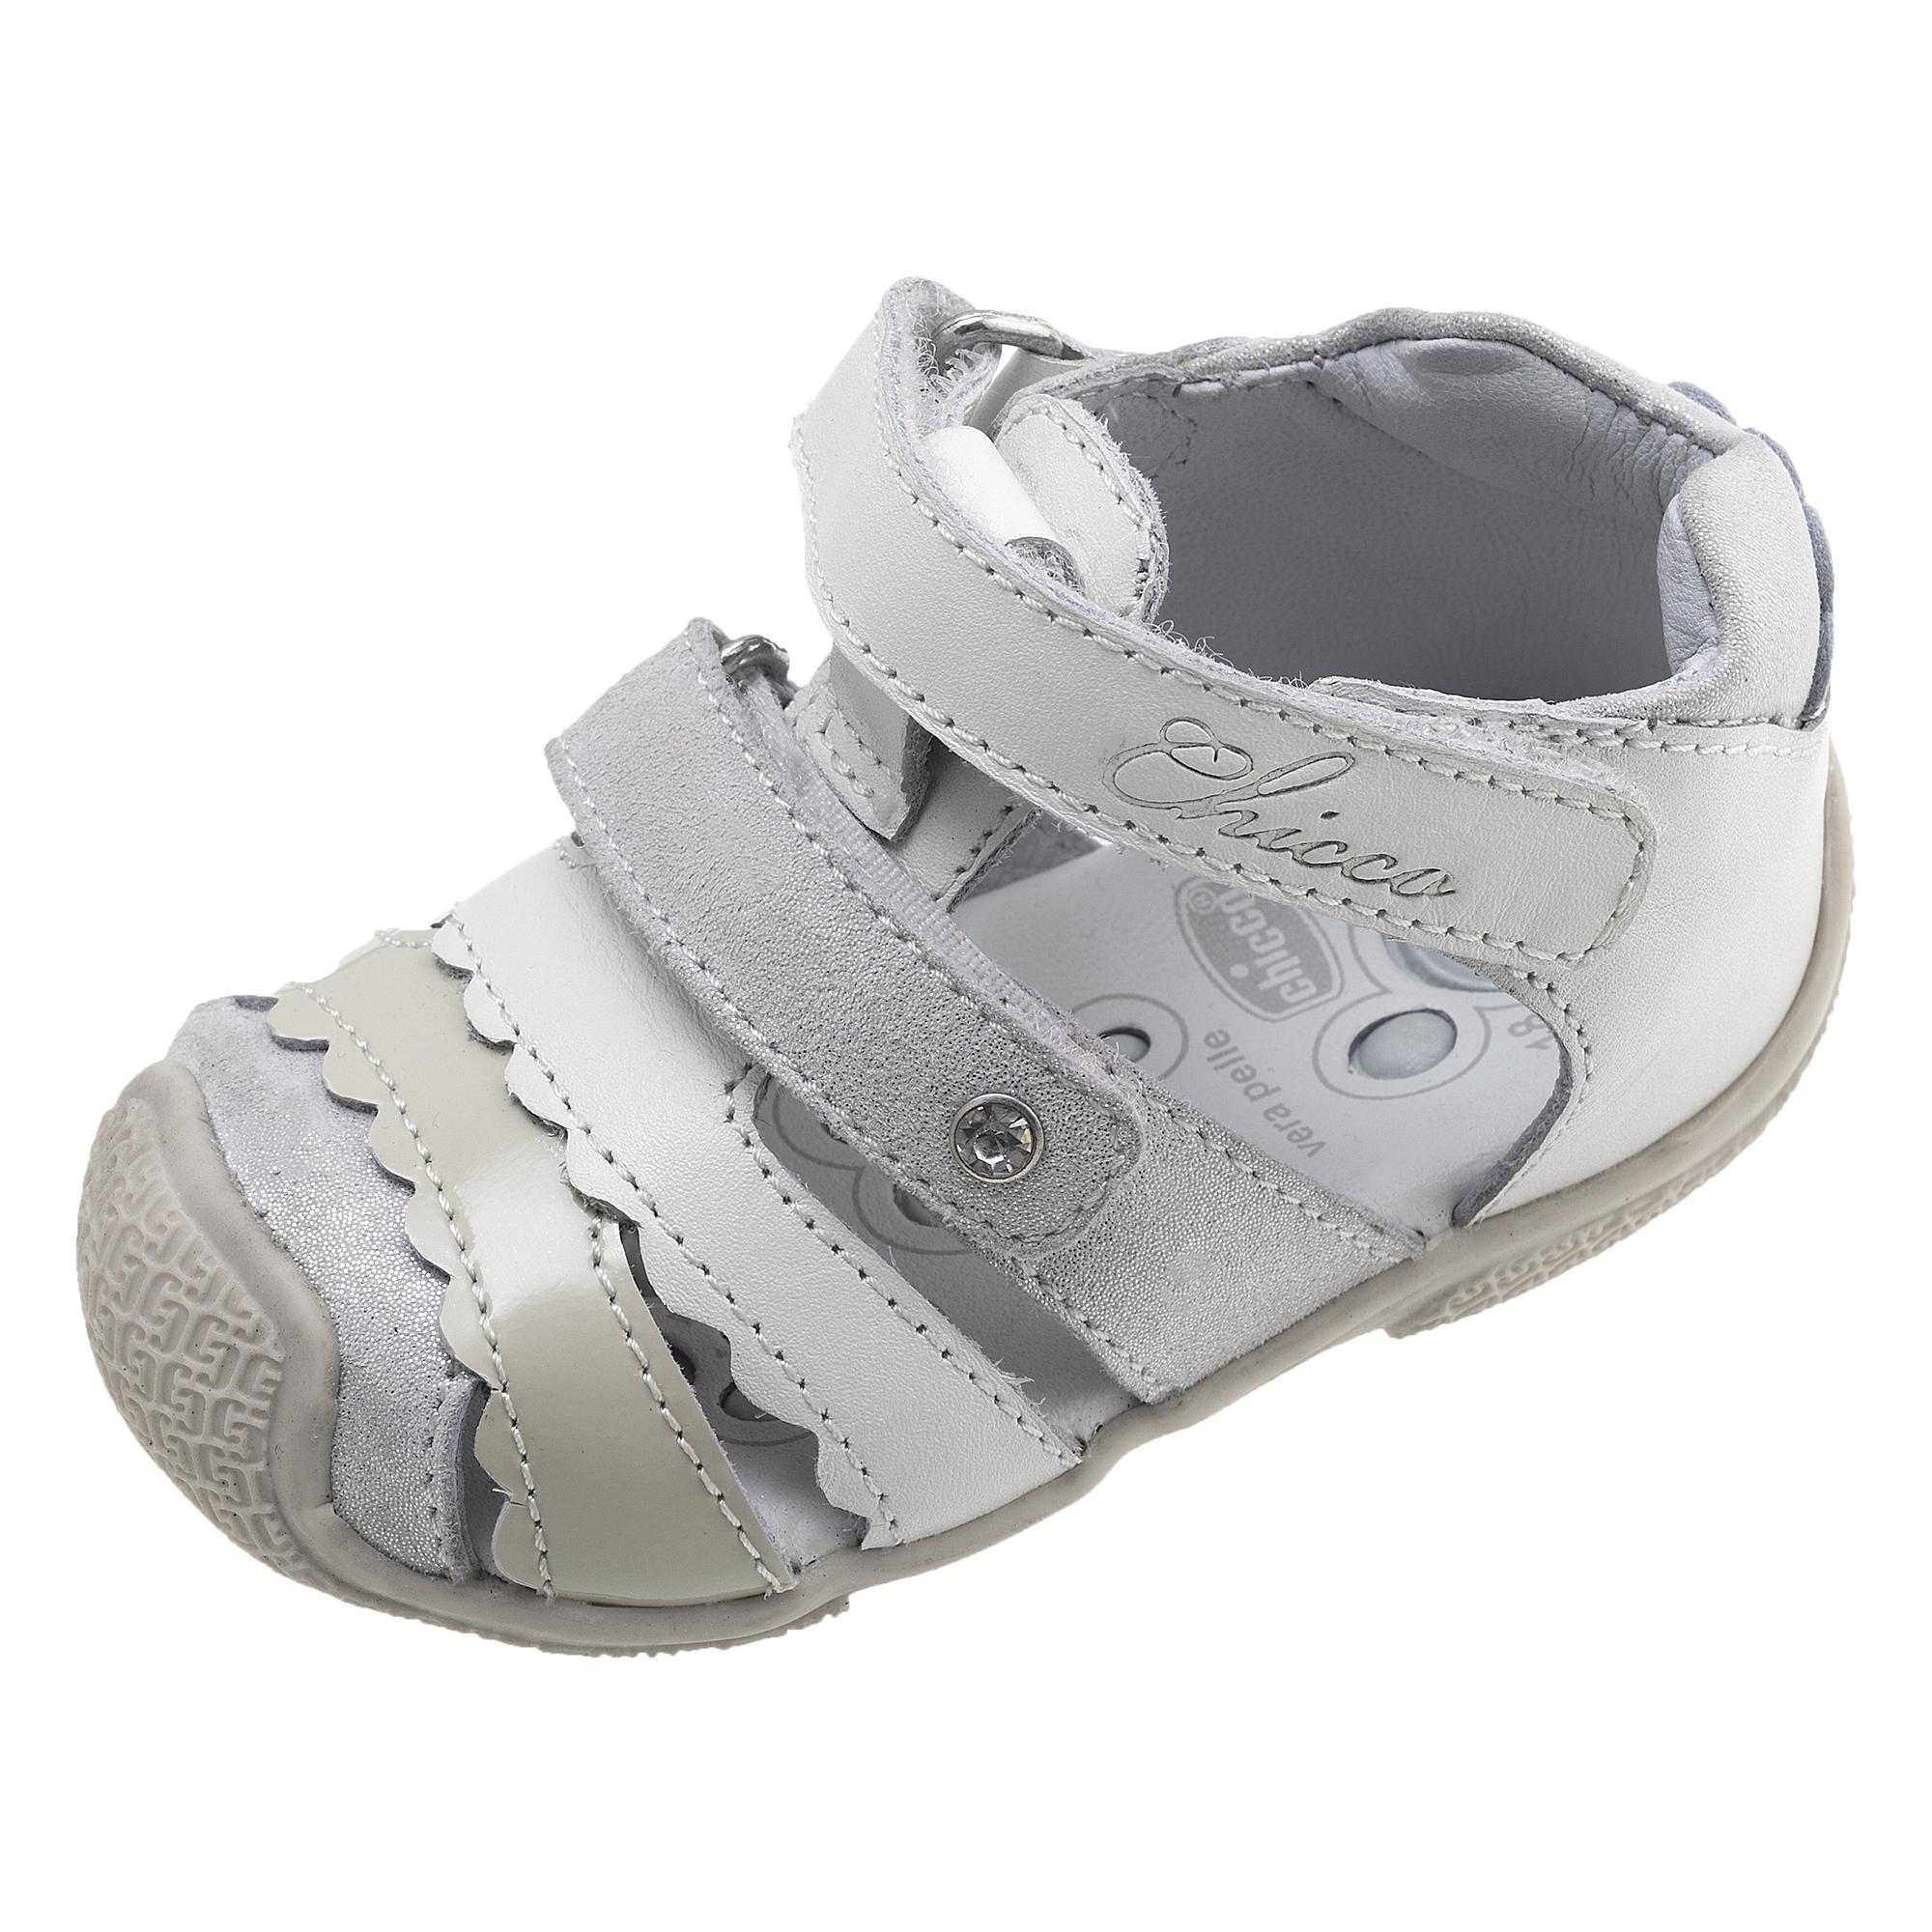 Sandale Copii Chicco Georgiana, Alb, 63804 imagine